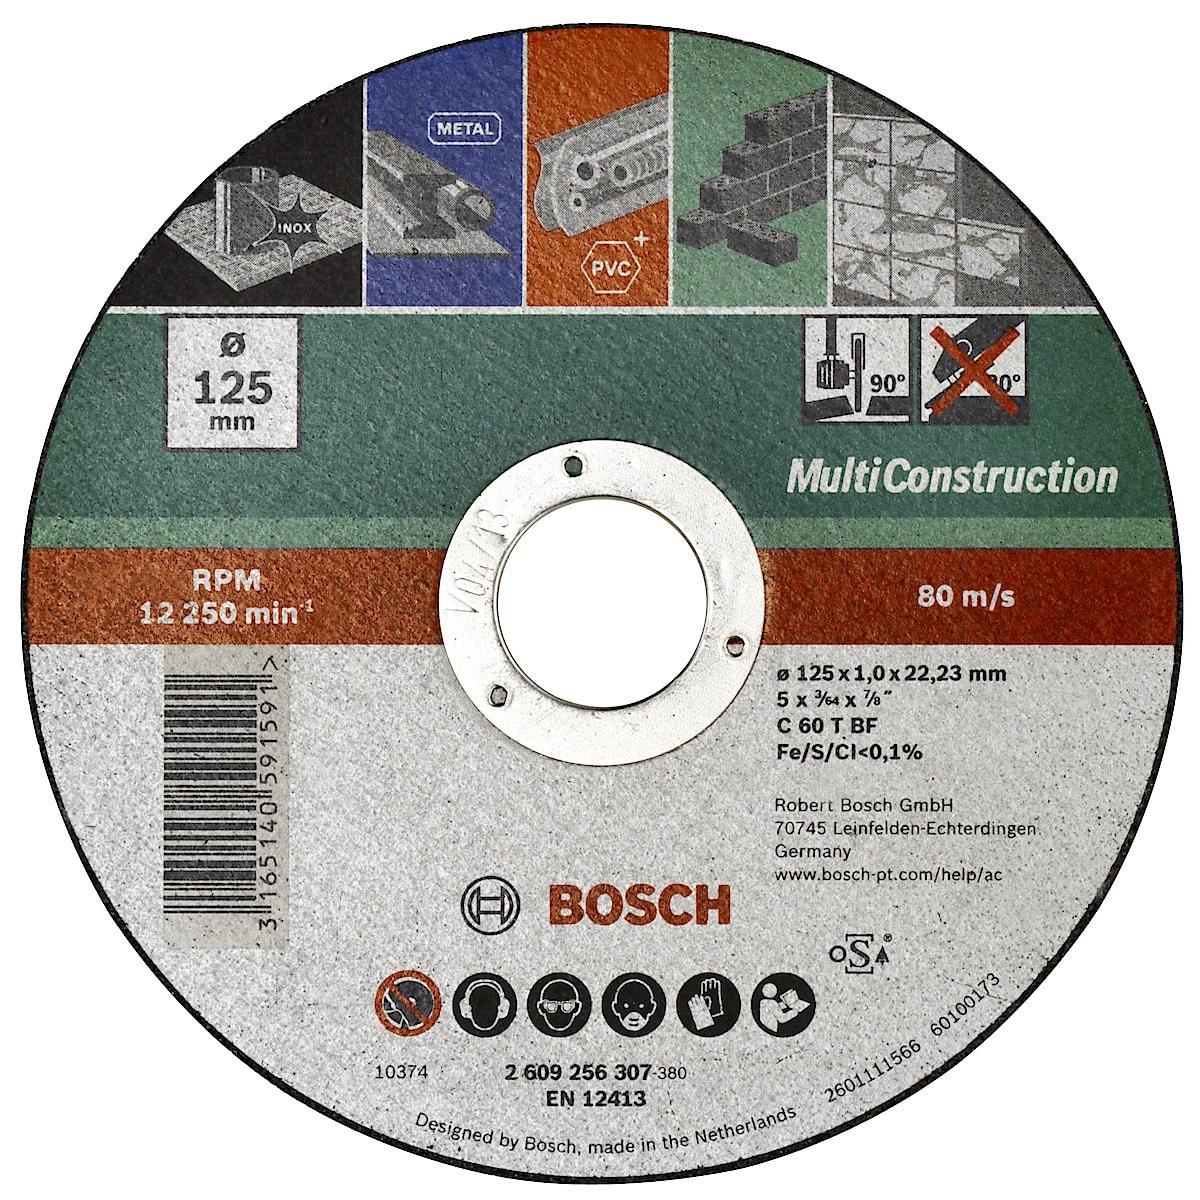 Kapskiva universal 125 mm Bosch